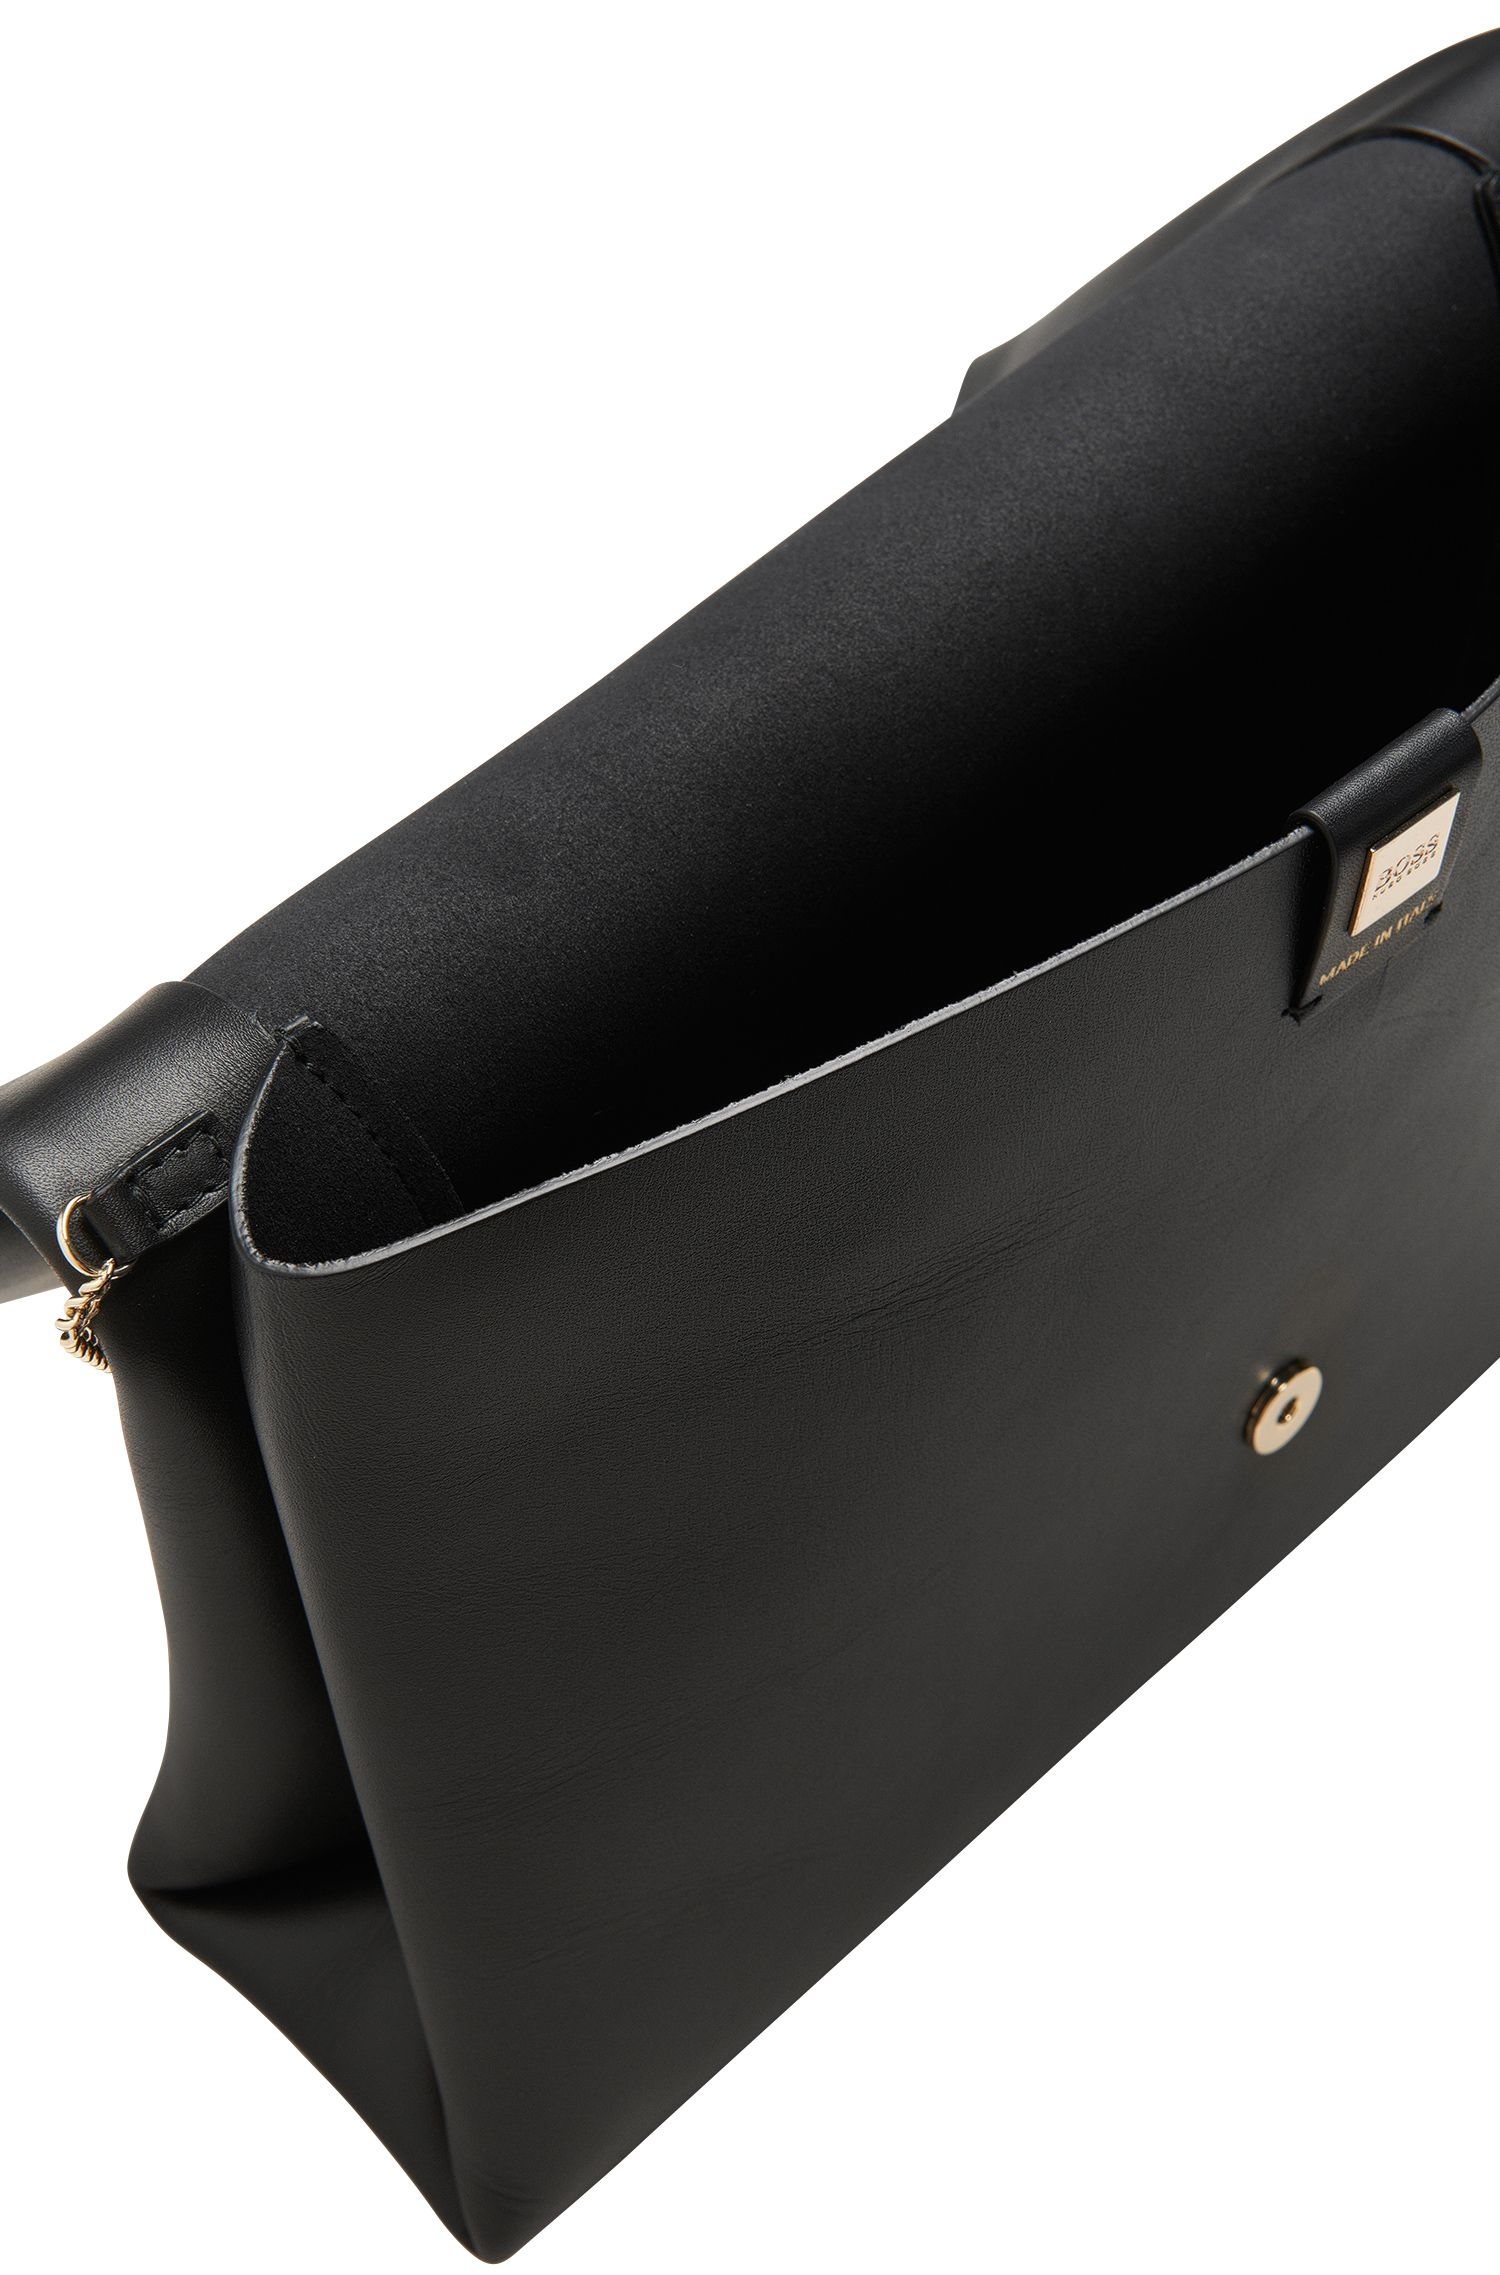 Pochette en cuir : « Luxury Staple C » 6jEtu